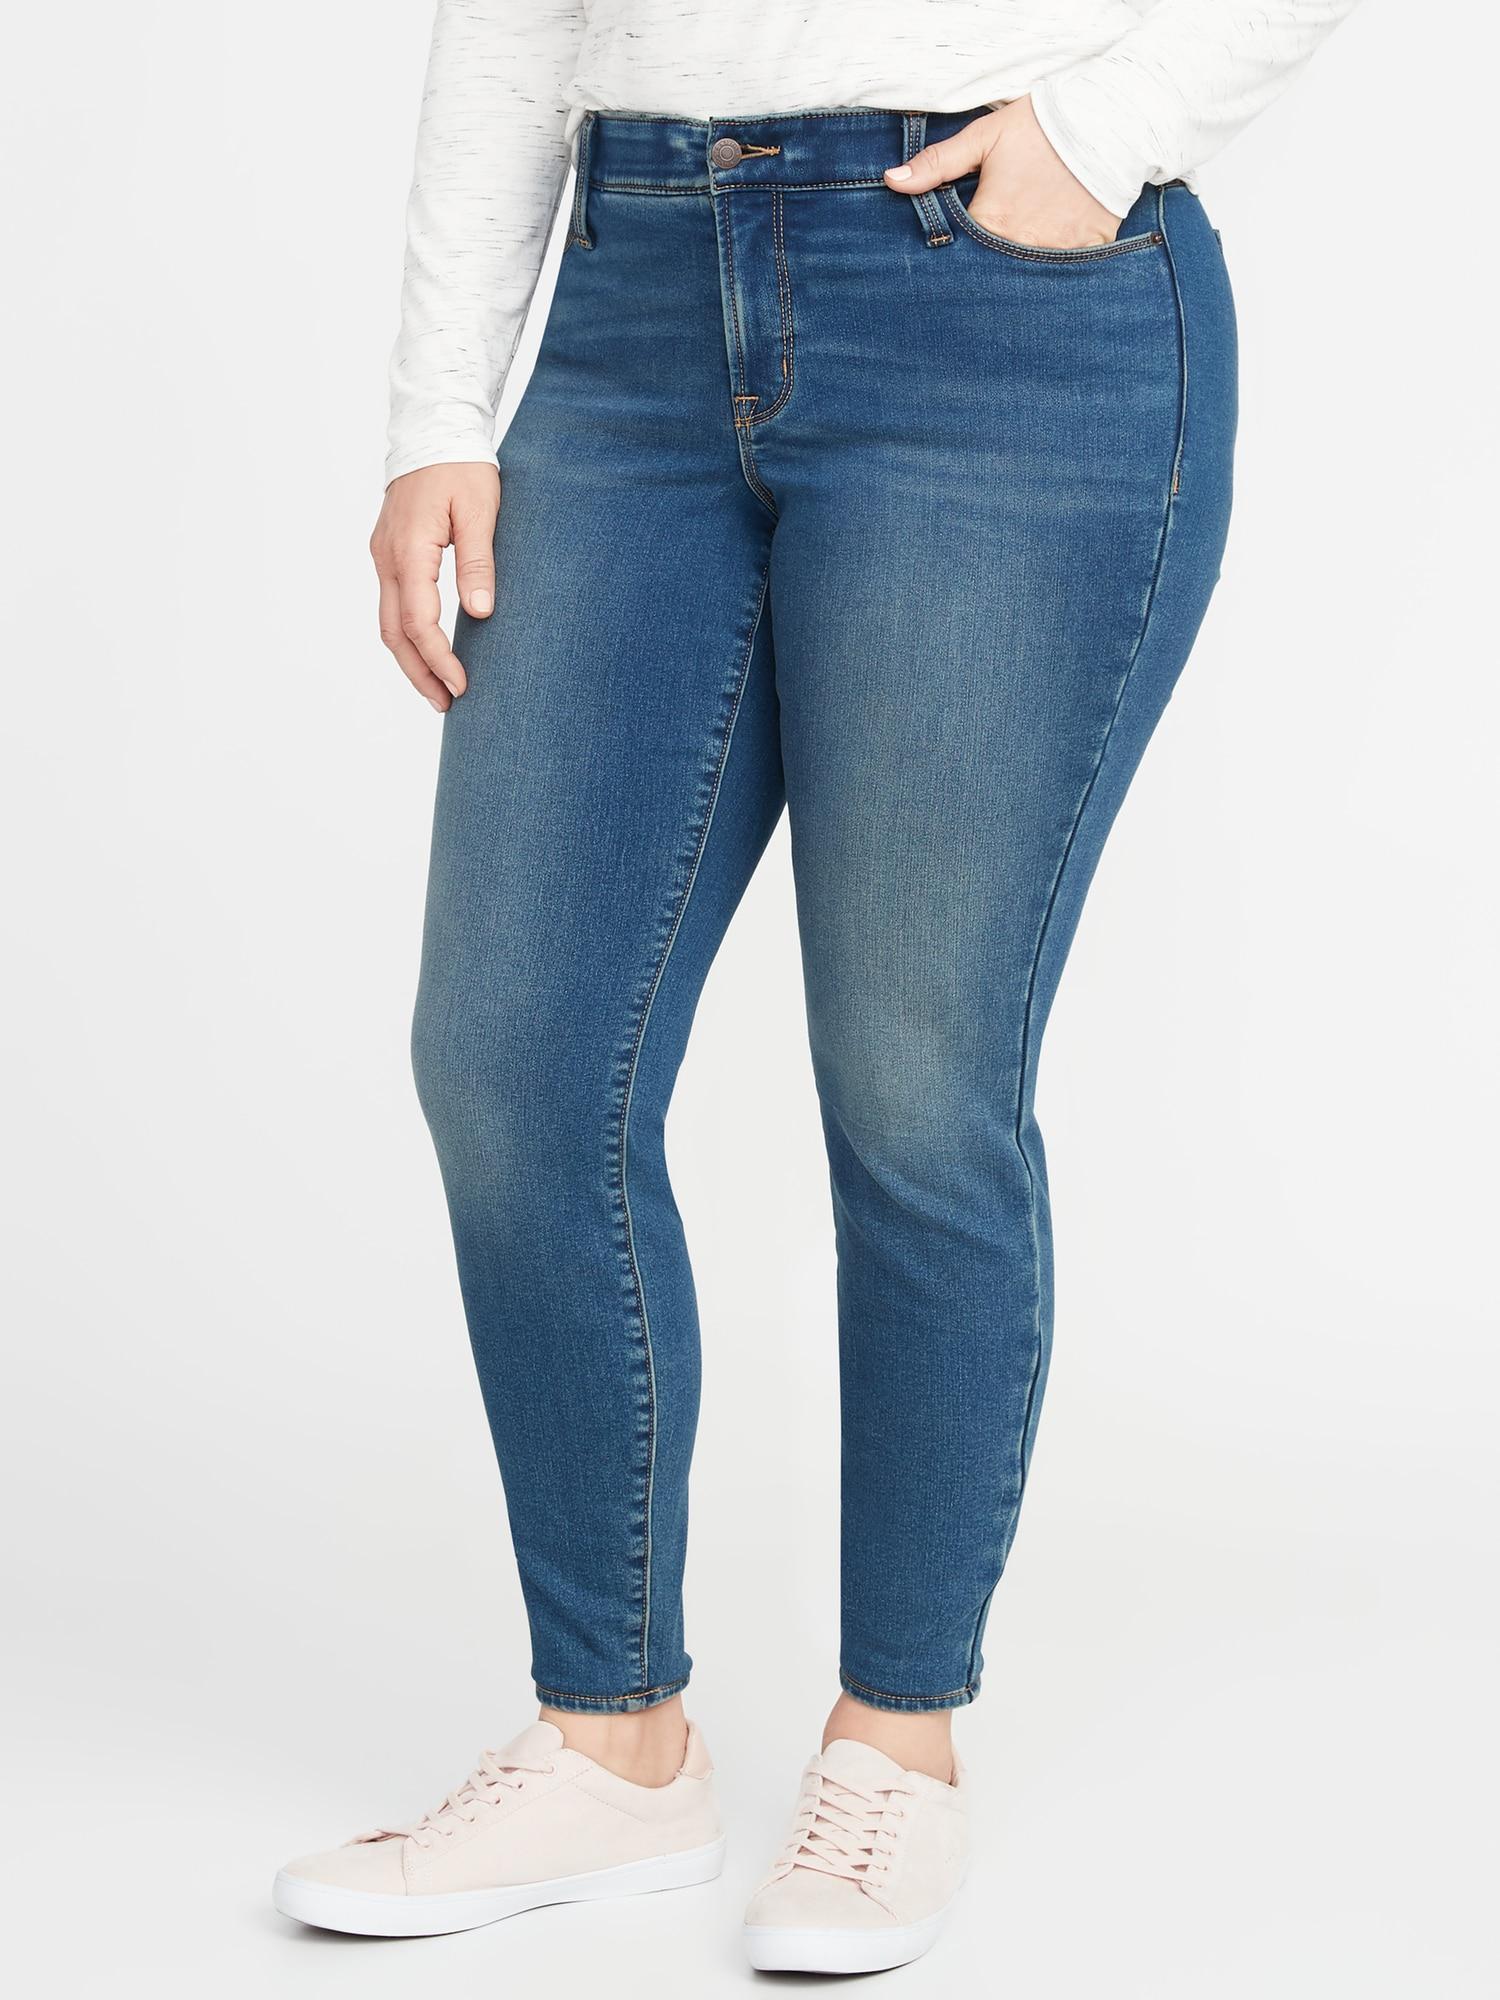 97cc7a92558 Old Navy. Women s Blue High-rise Secret-slim Pockets + Waistband Built-in  Warm Rockstar Super Skinny Plus-size Jeans